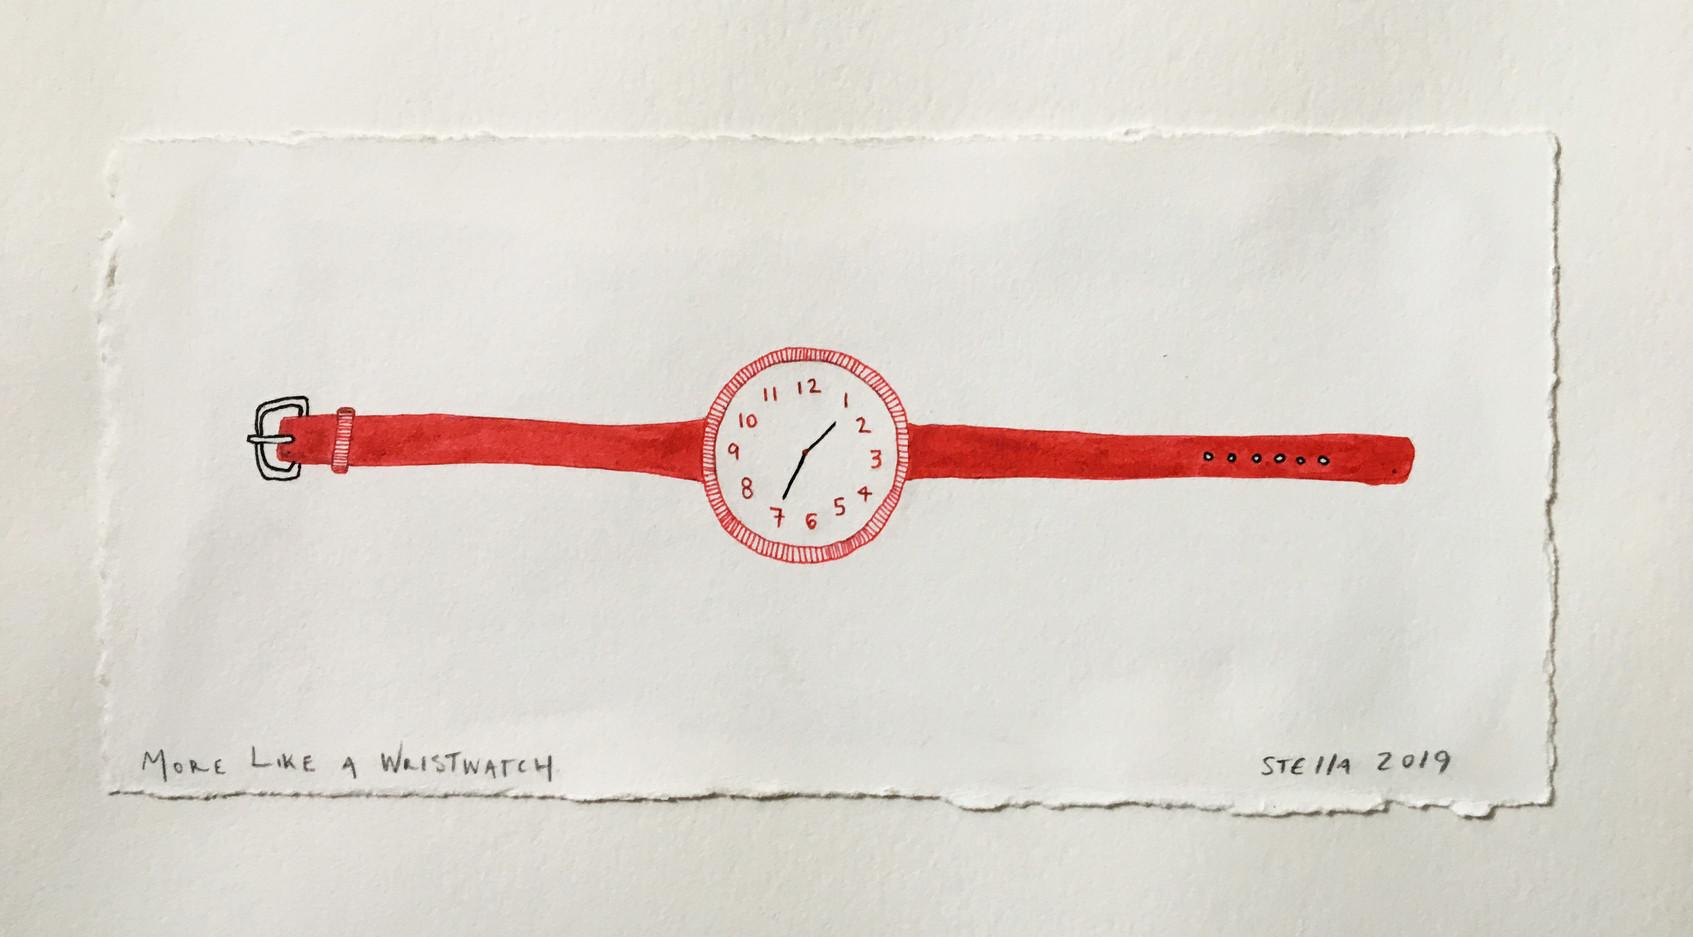 More like a Wristwatch